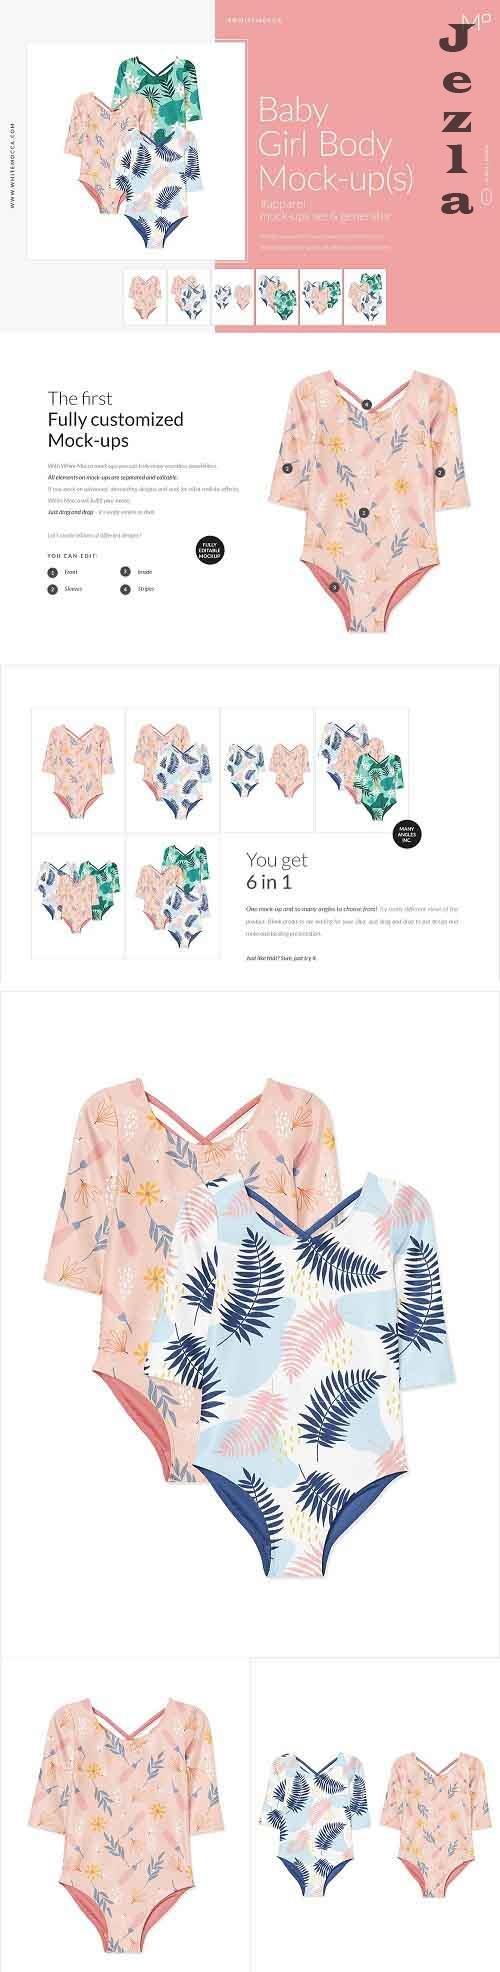 CreativeMarket - Baby Girl Body Mock-ups Set 4523643